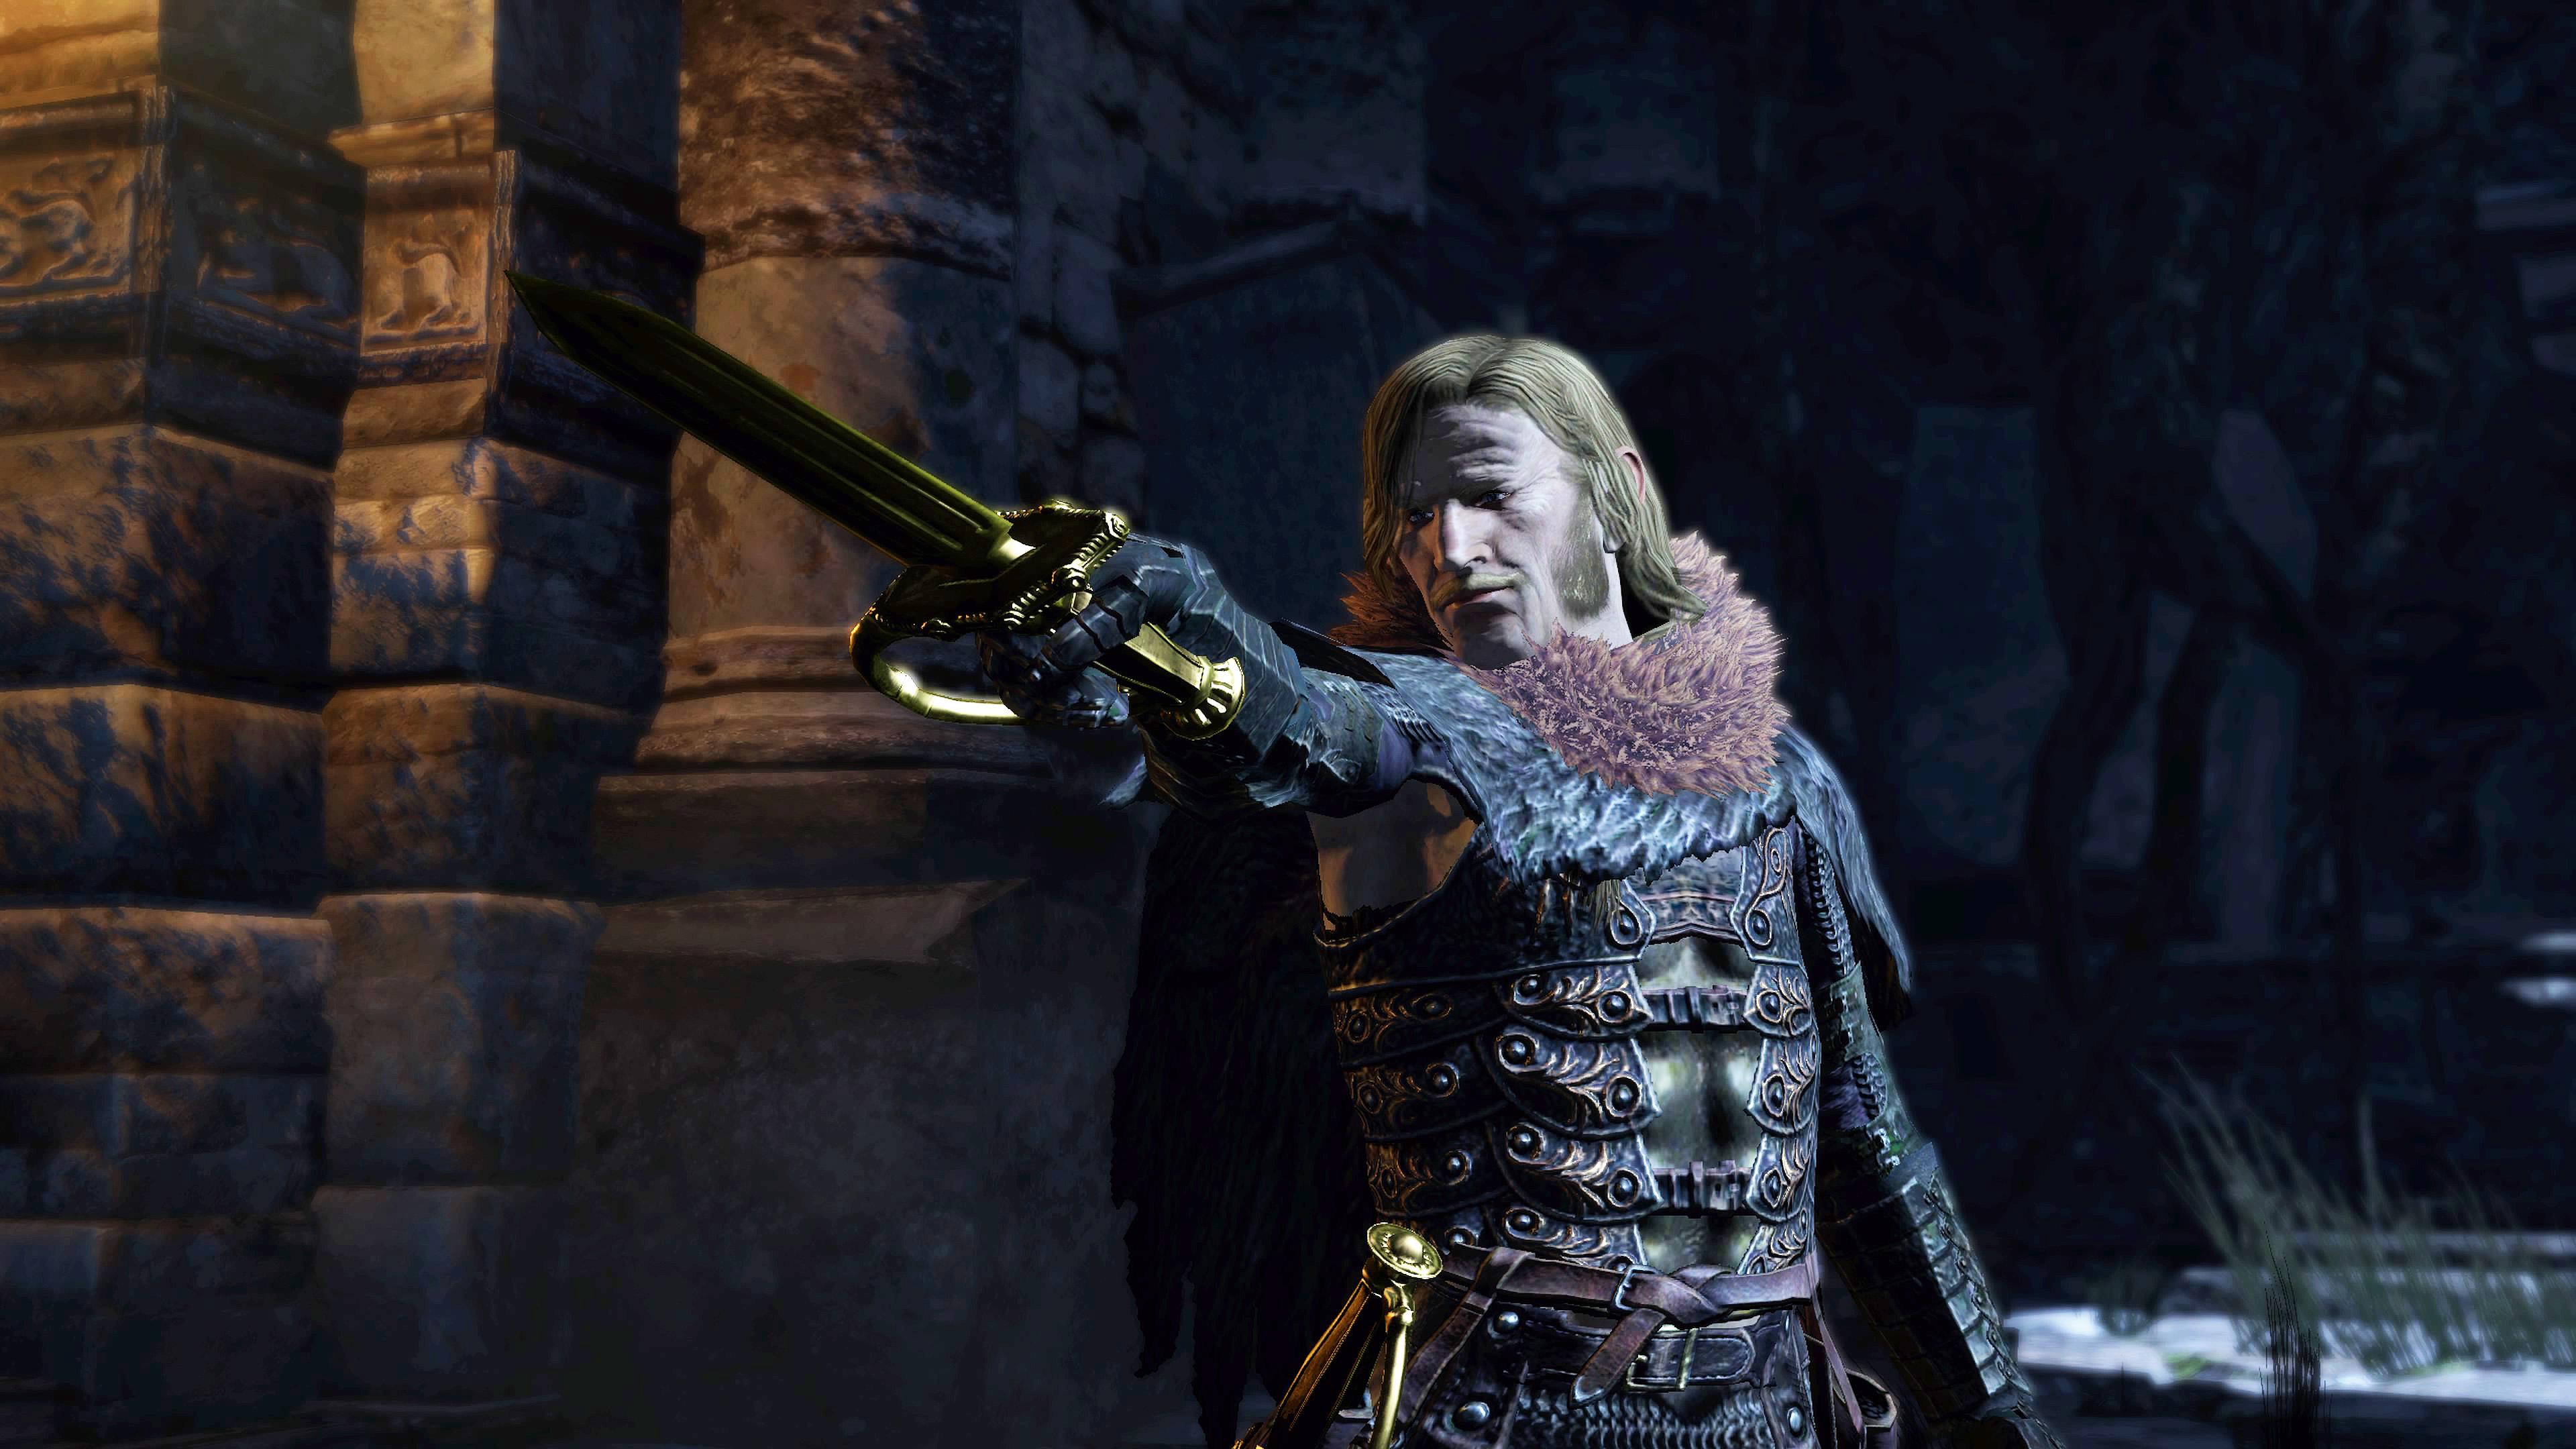 3. října vyjde Dragon's Dogma: Dark Arisen pro PS4 a Xbox One 148237